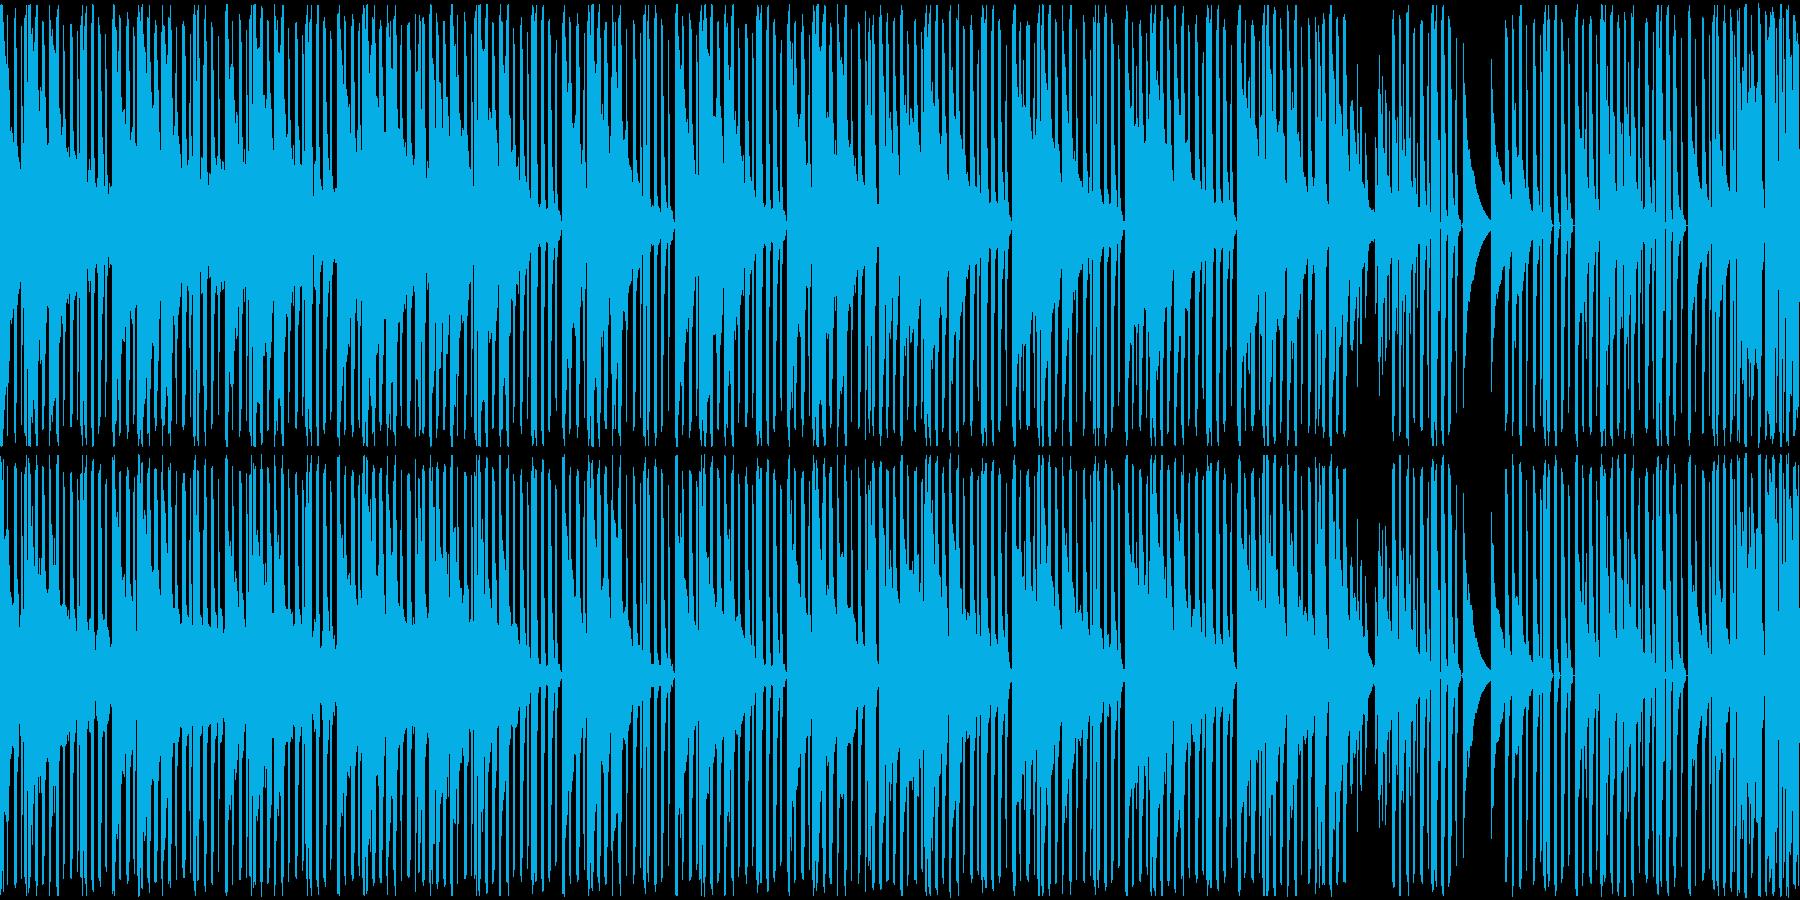 HIPHOP R&B 海 海岸 車 LPの再生済みの波形